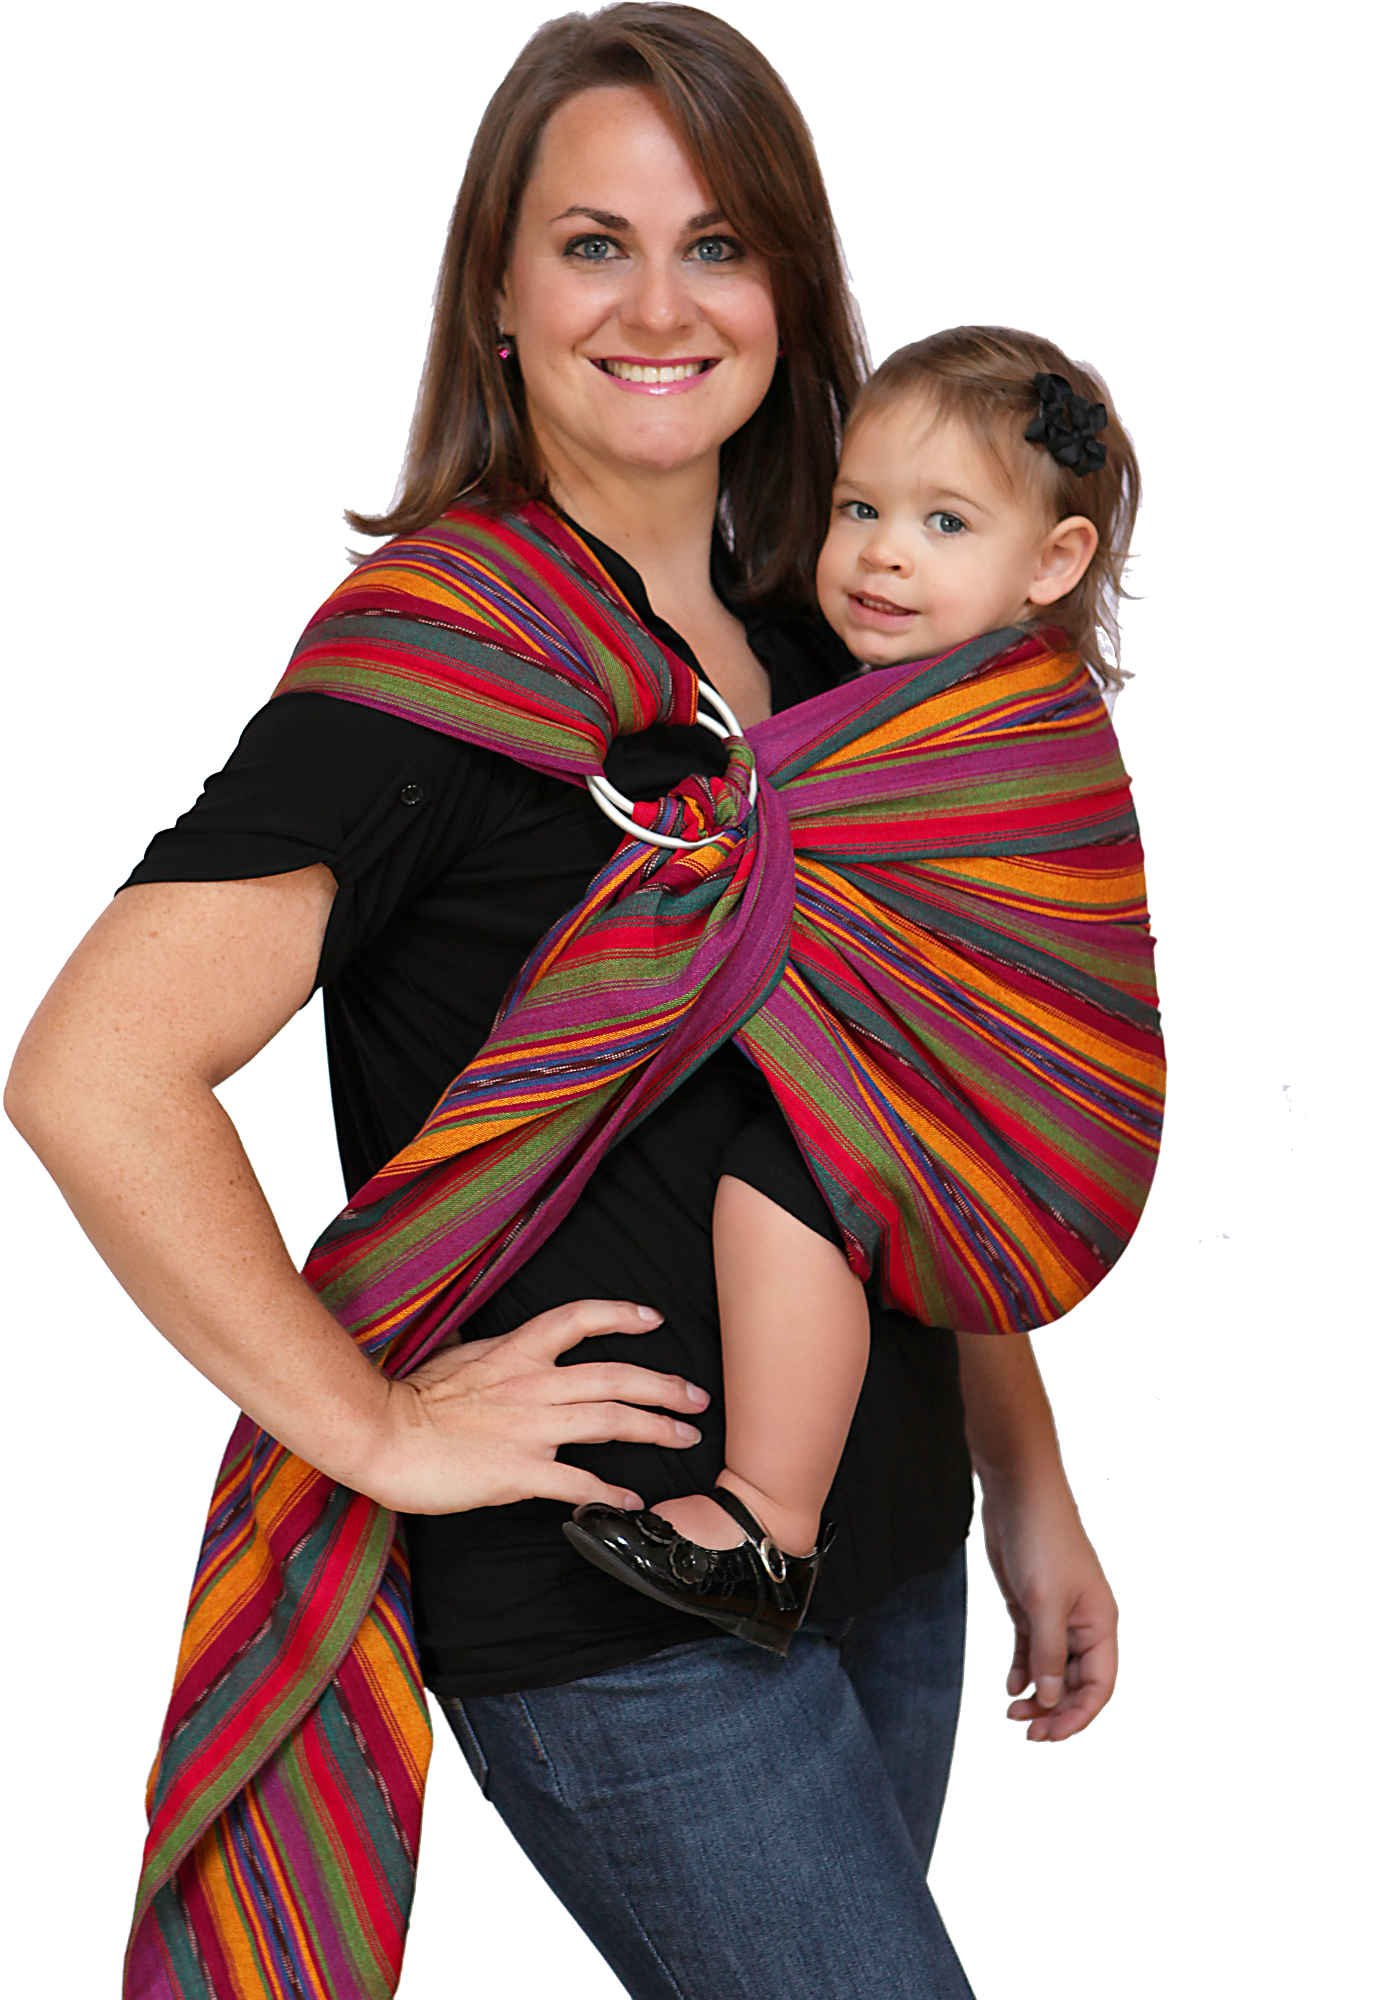 Maya Wrap Lightly Padded Ring Sling Baby Carrier - Bright Stripes - Medium product image